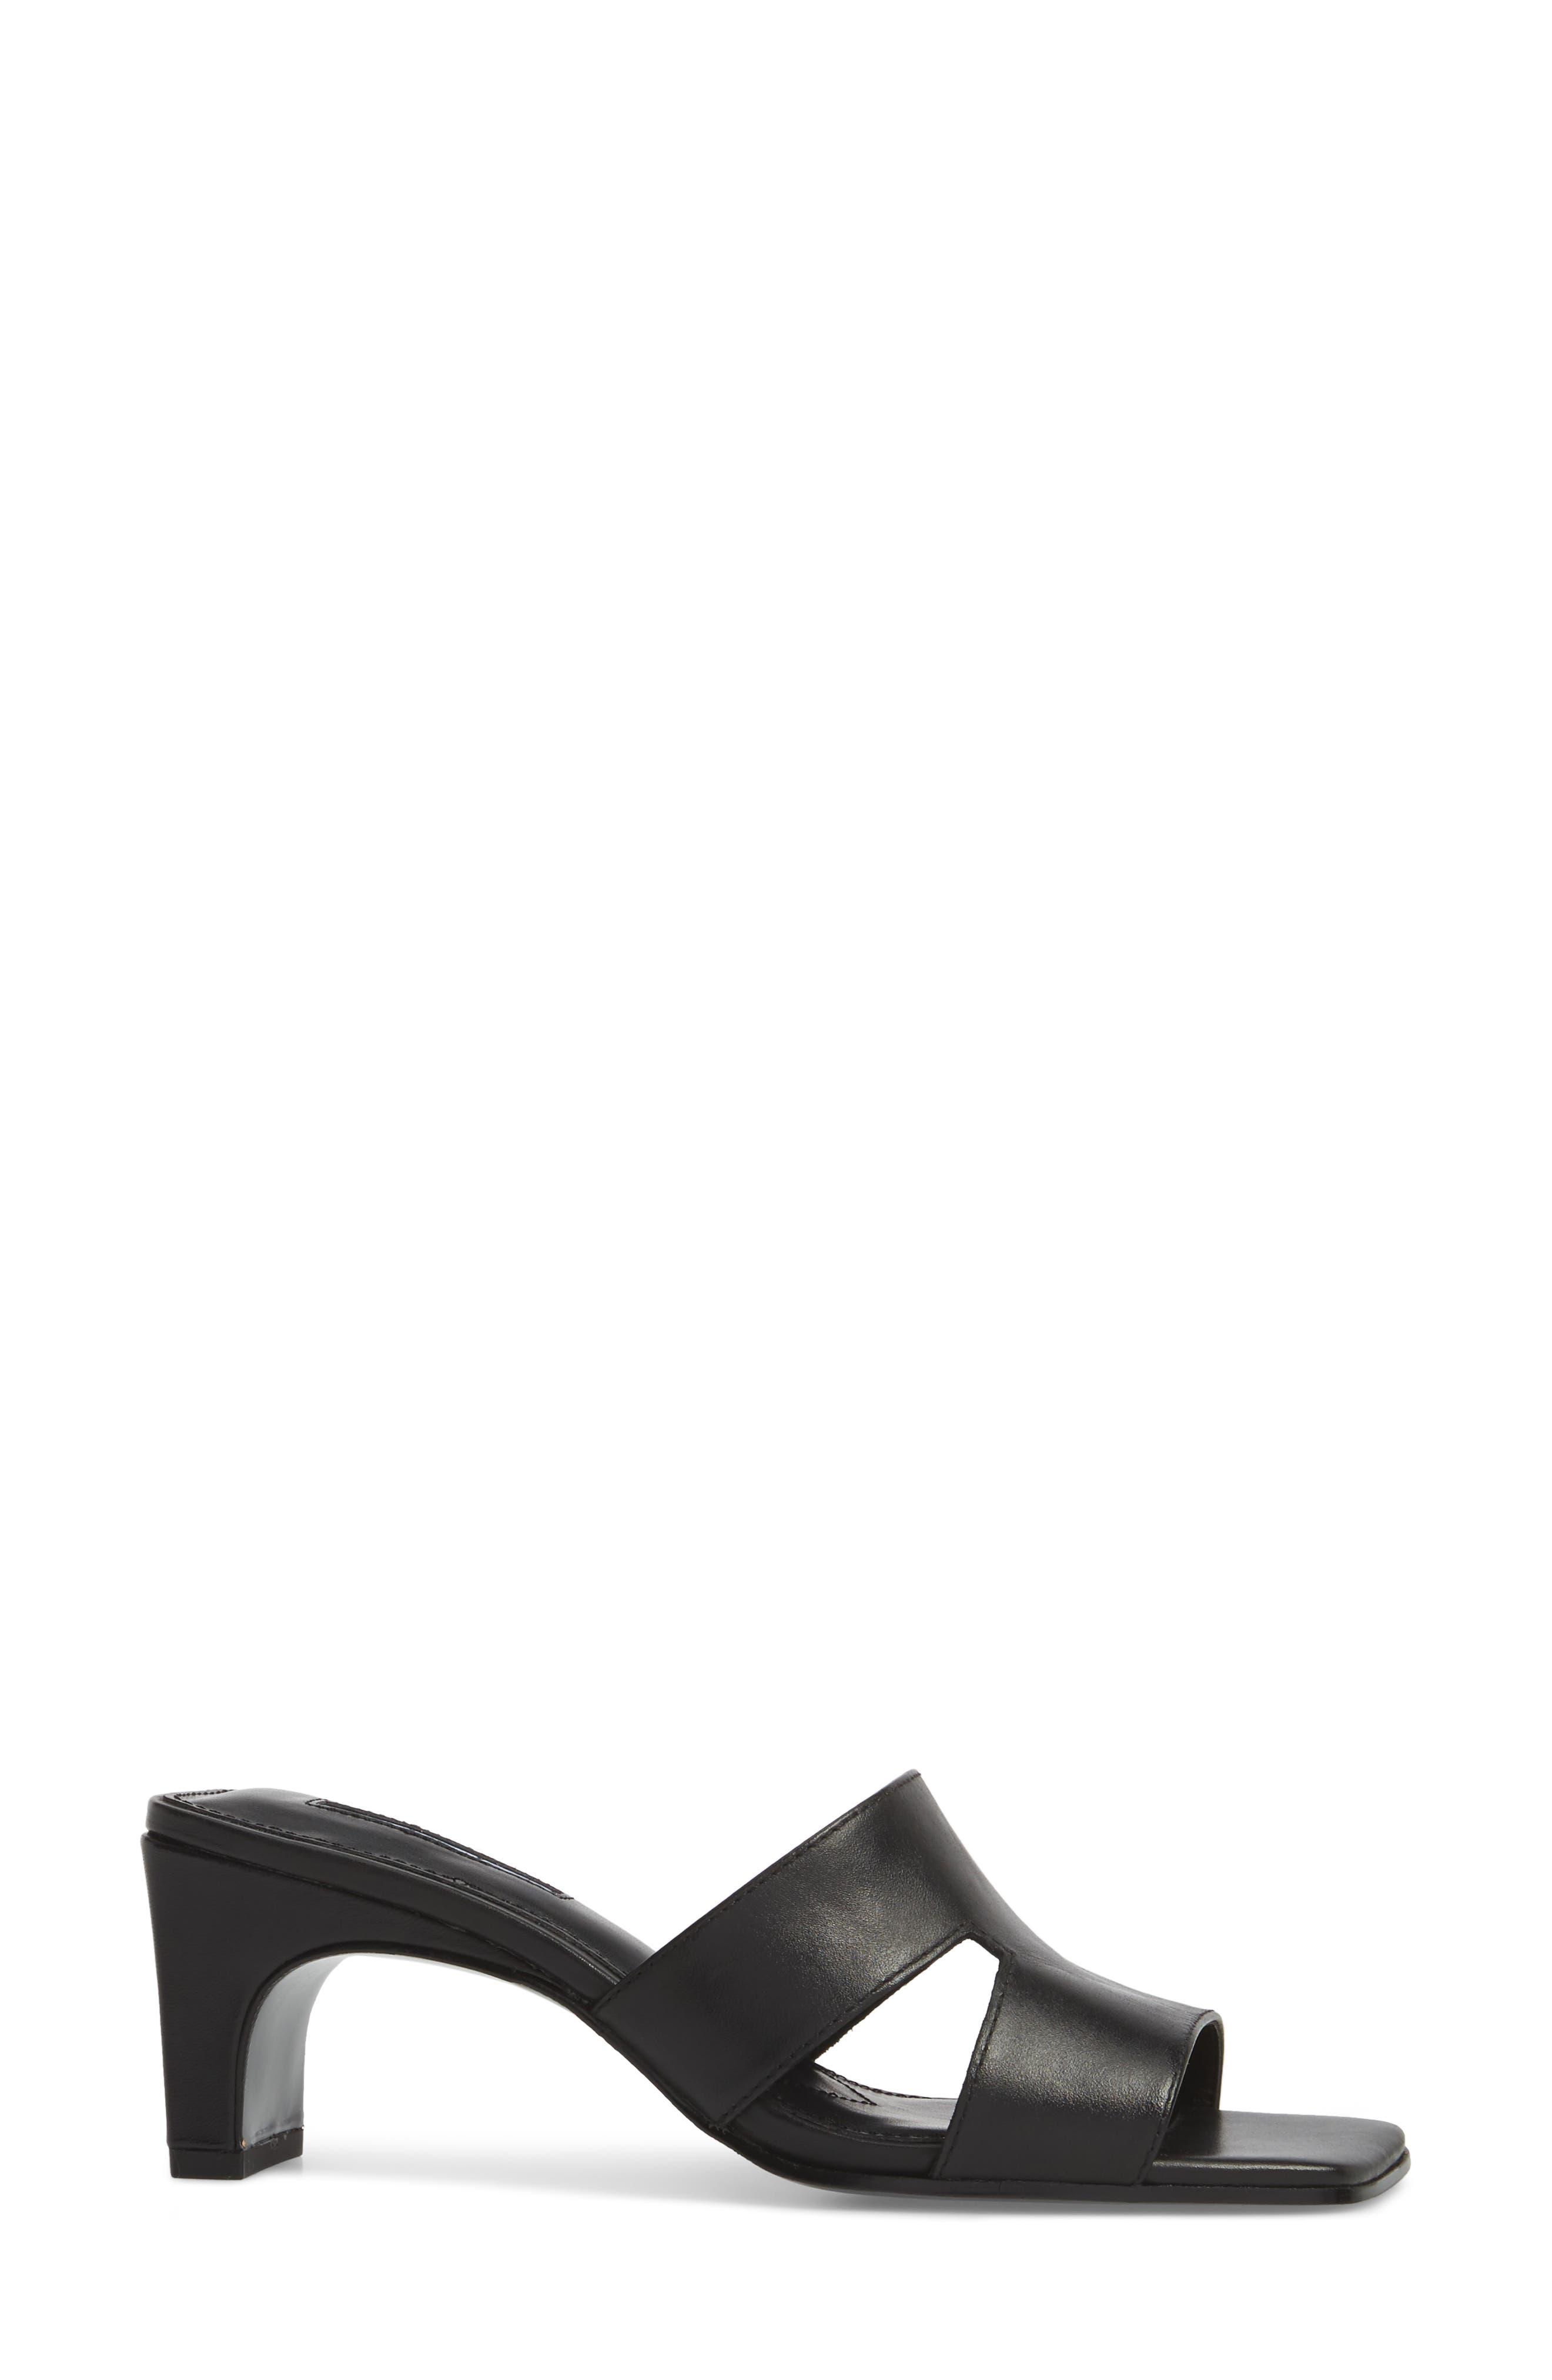 Harley Slide Sandal,                             Alternate thumbnail 3, color,                             BLACK LEATHER